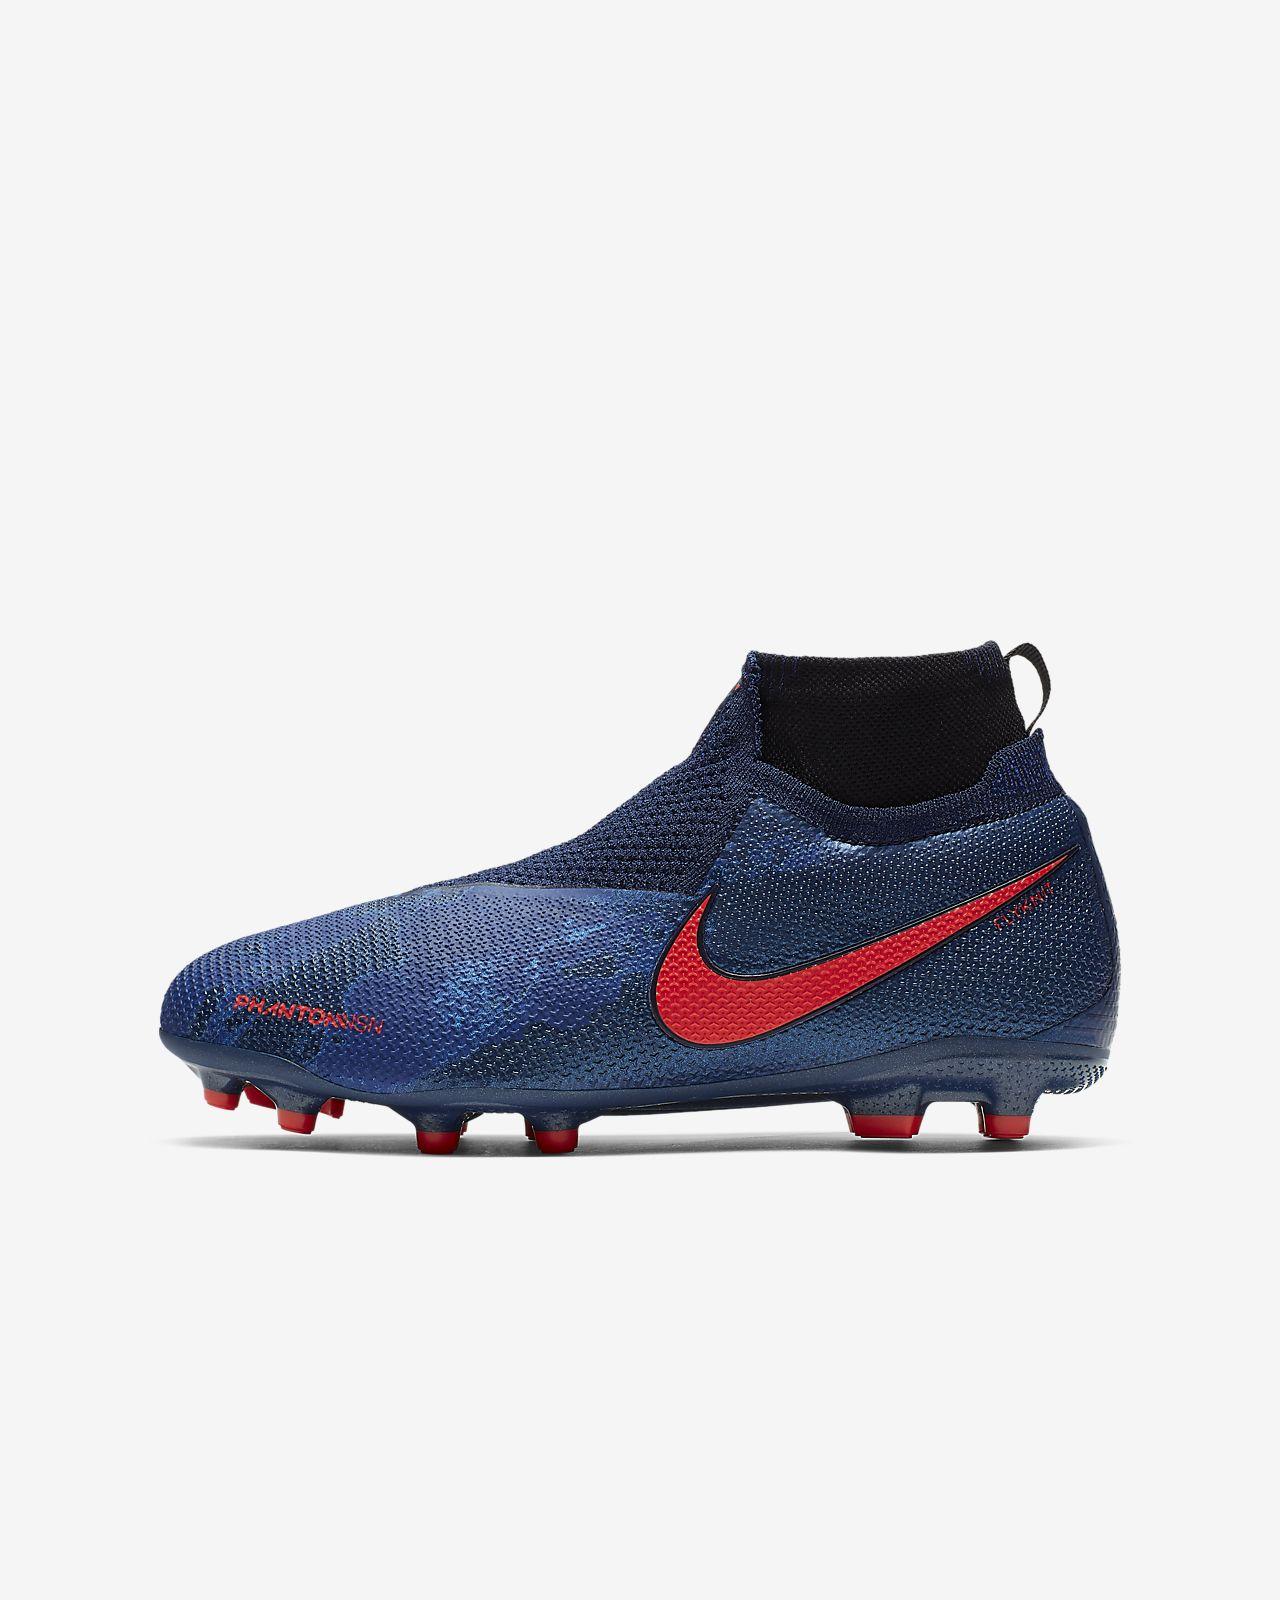 new product 9940f 577af ... Nike Jr. PhantomVSN Elite Dynamic Fit MG Big Kids Multi-Ground Soccer  Cleat